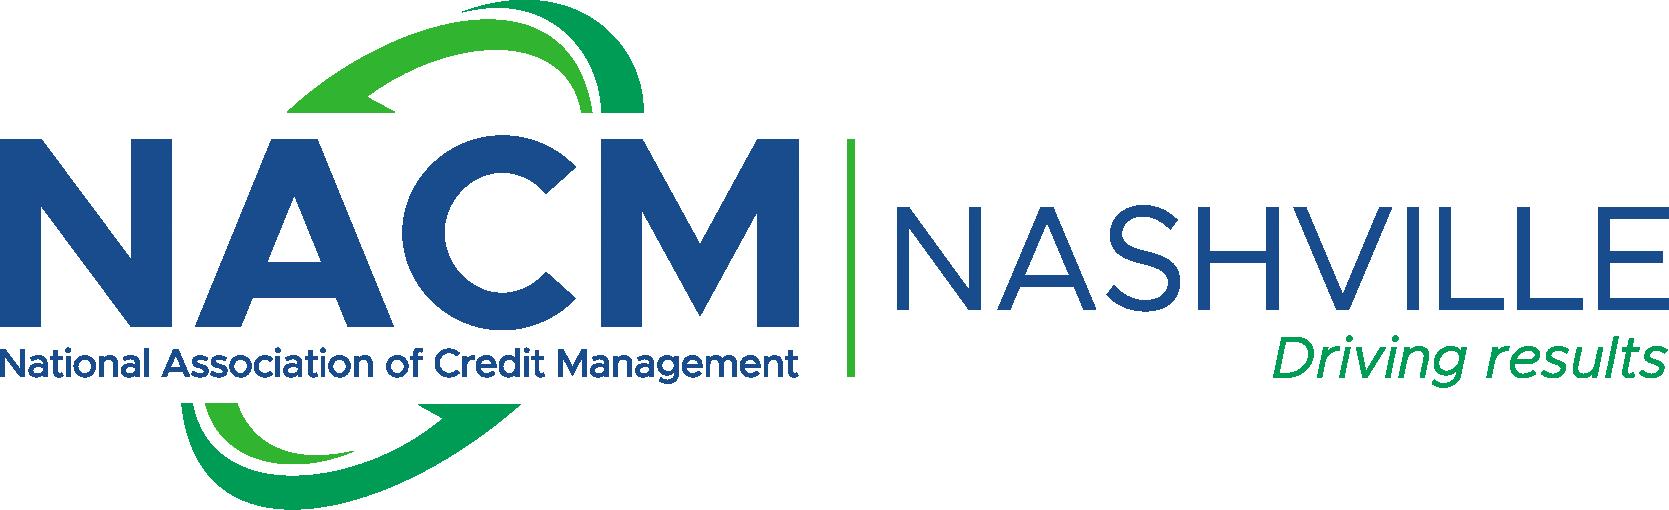 nacm nashville logo